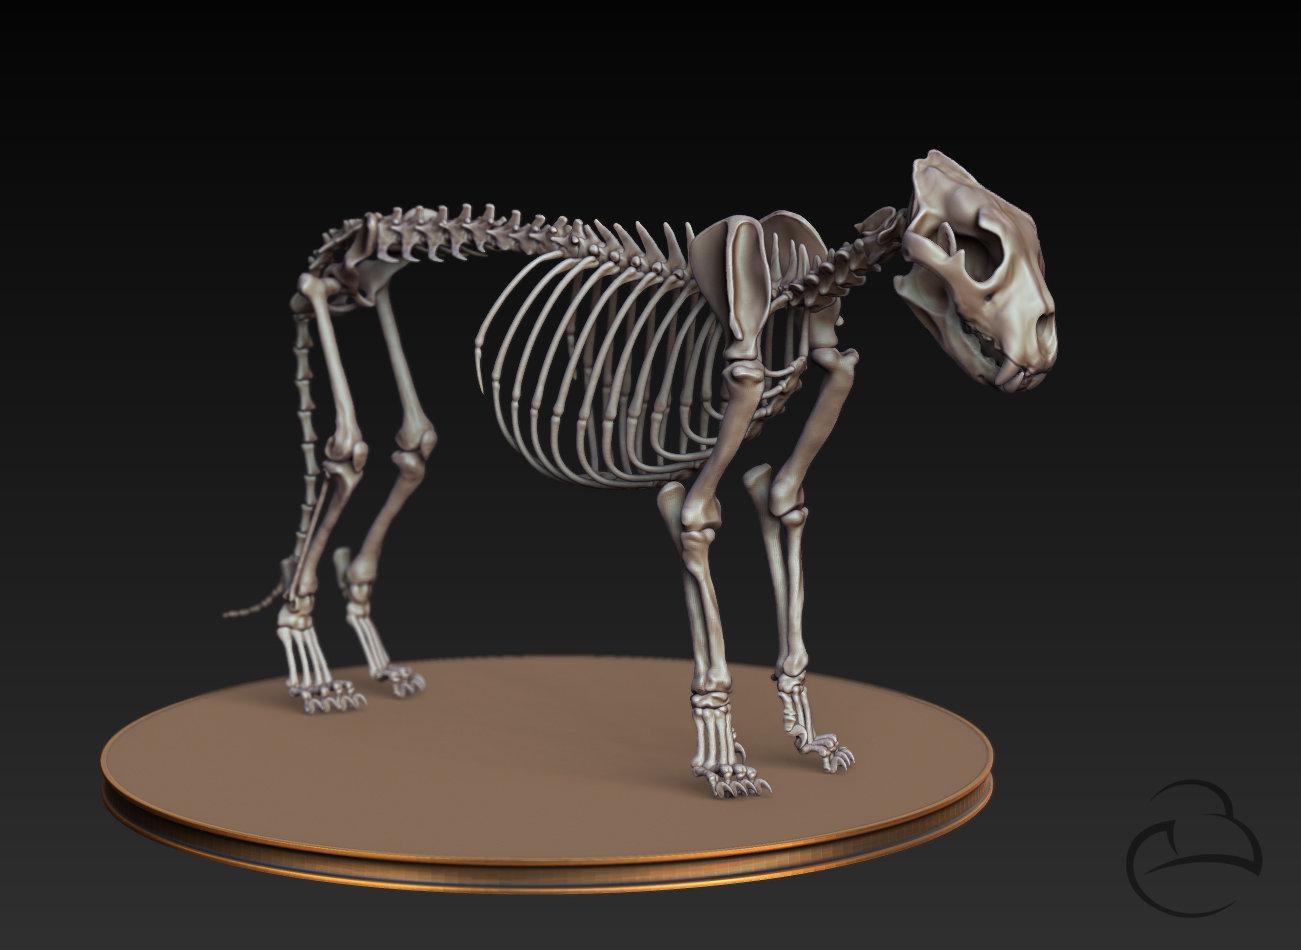 ArtStation - Lion skeleton anatomy, Peter Bara